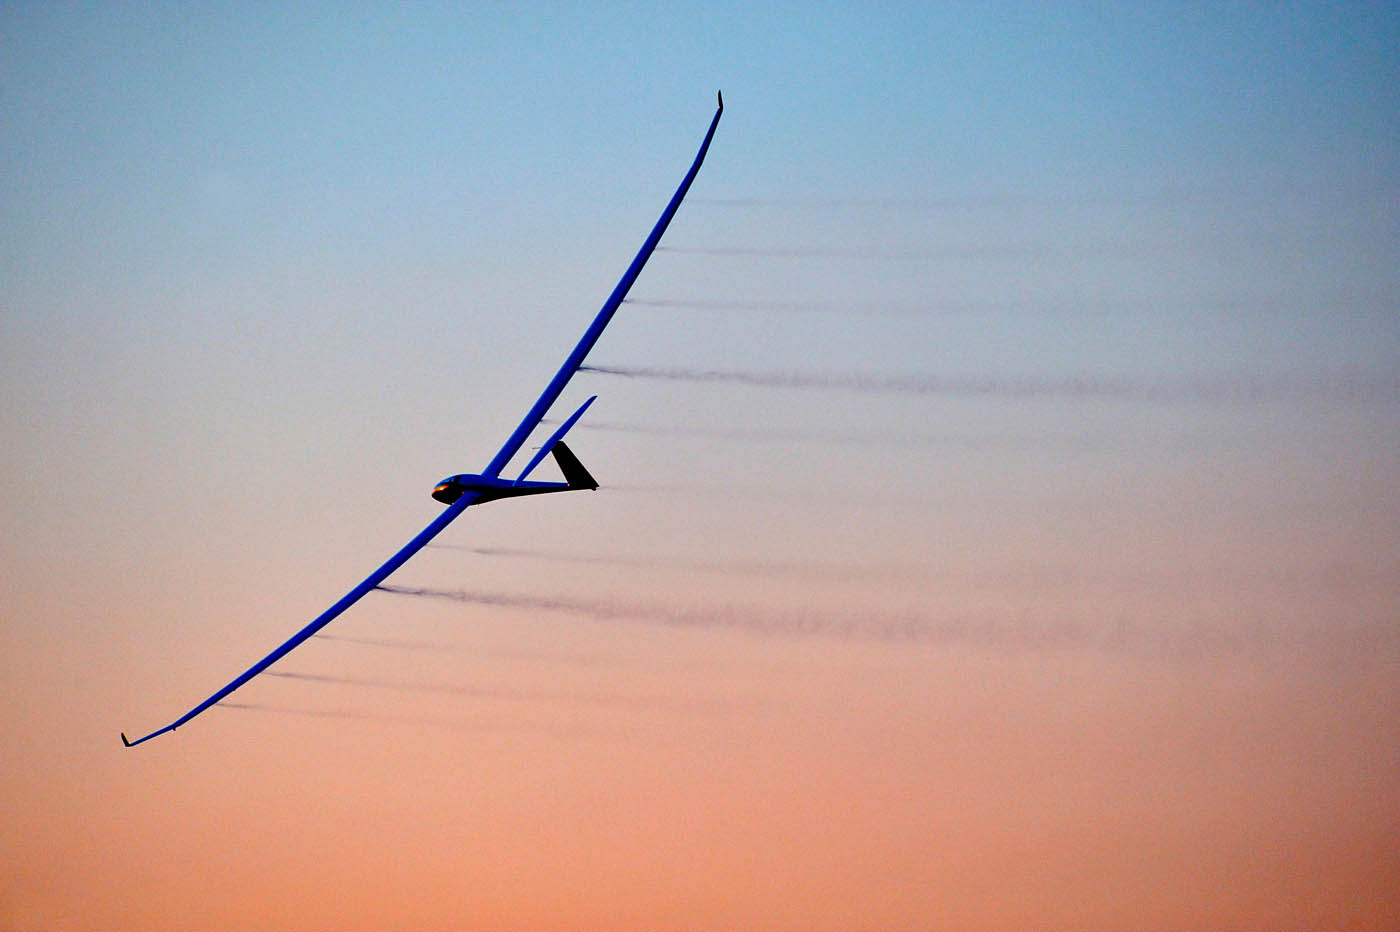 DGKXXW Quintus glider, Hamburg, Hamburg, Germany